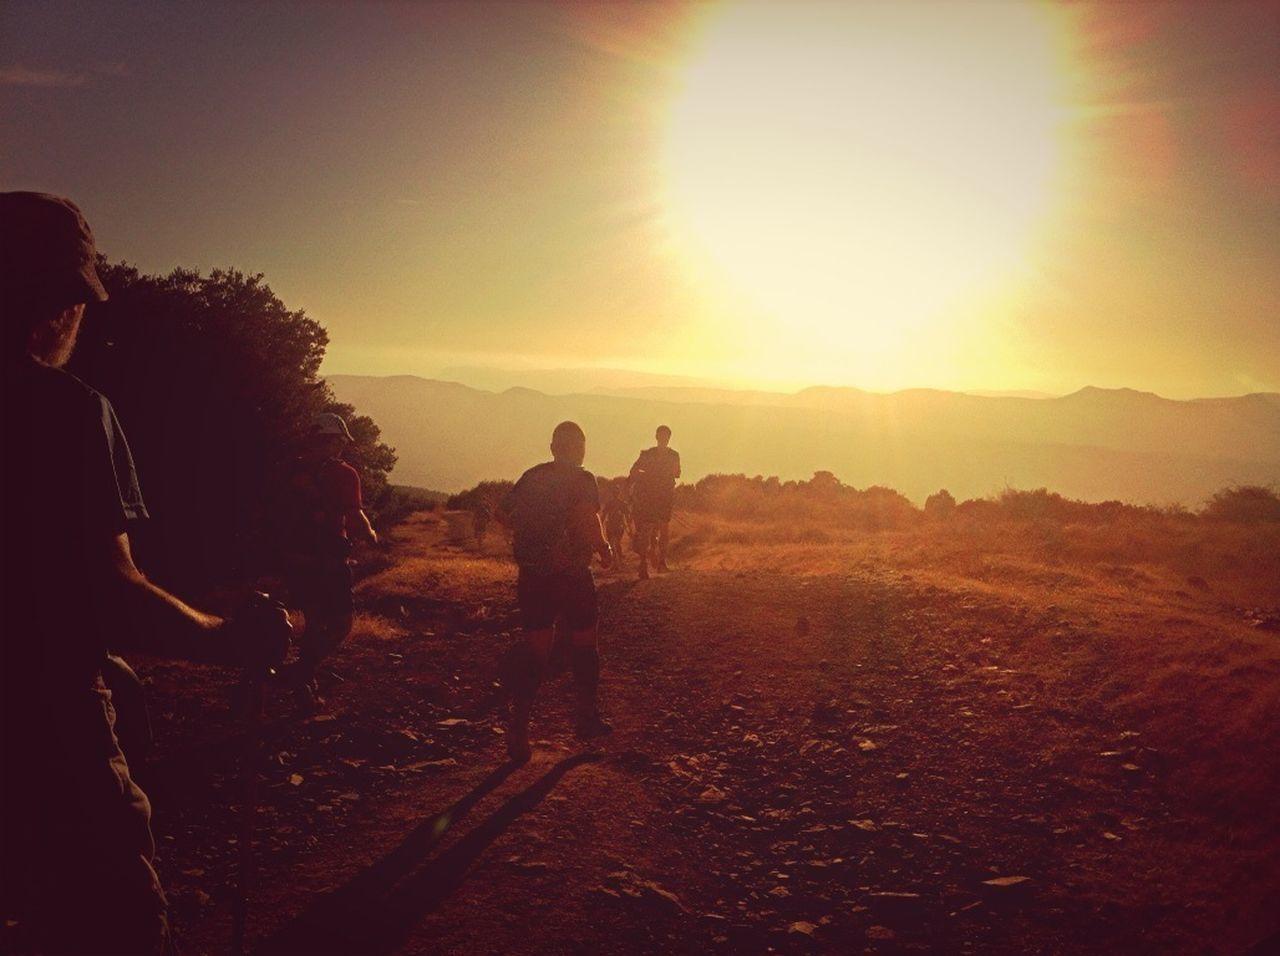 SUN SHINING THROUGH LANDSCAPE